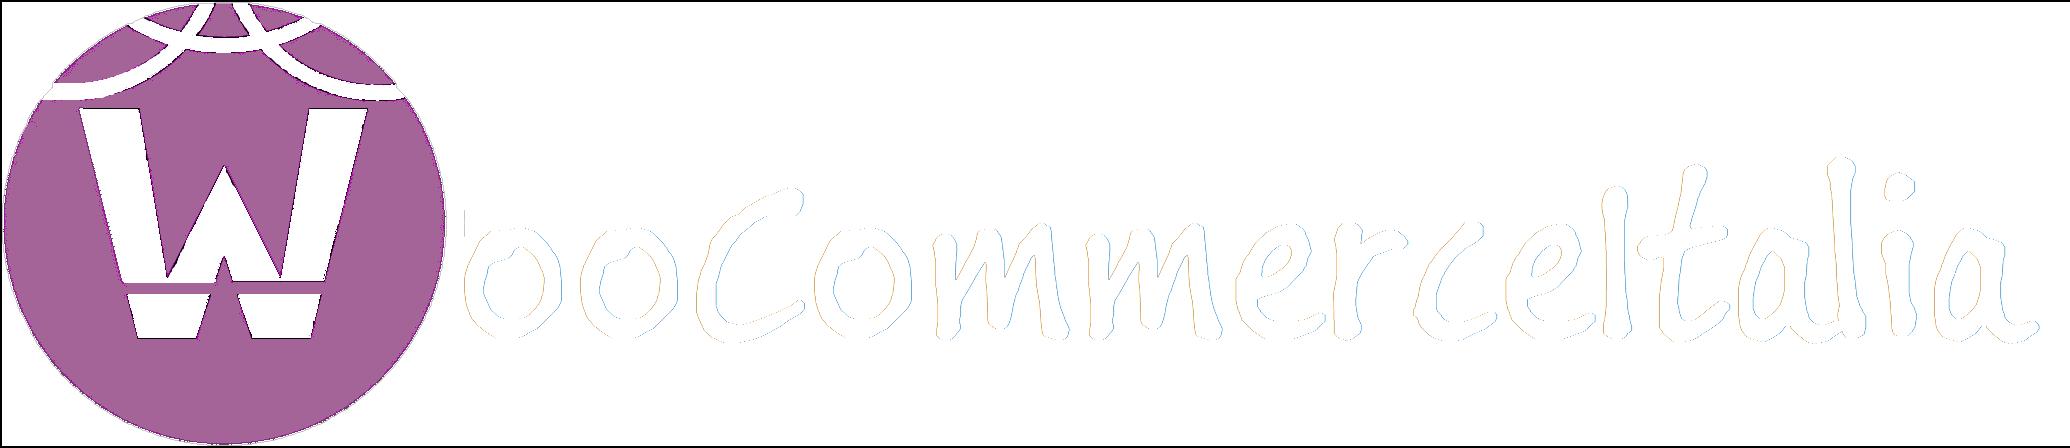 WooCommerce Italia